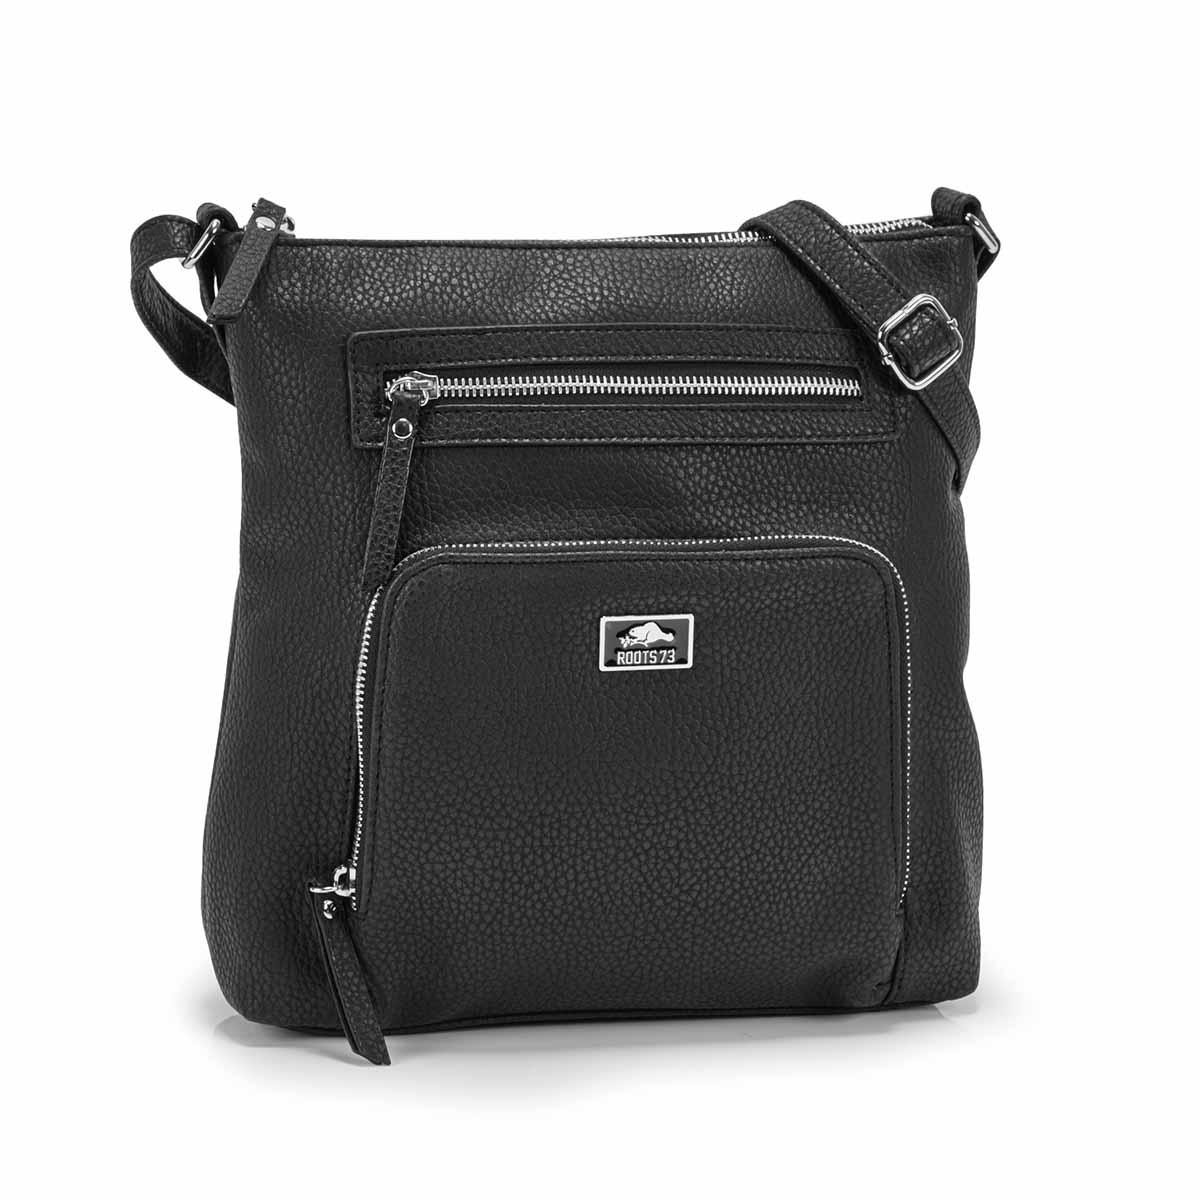 Women's R5387 black NORTH/SOUTH crossbody bag